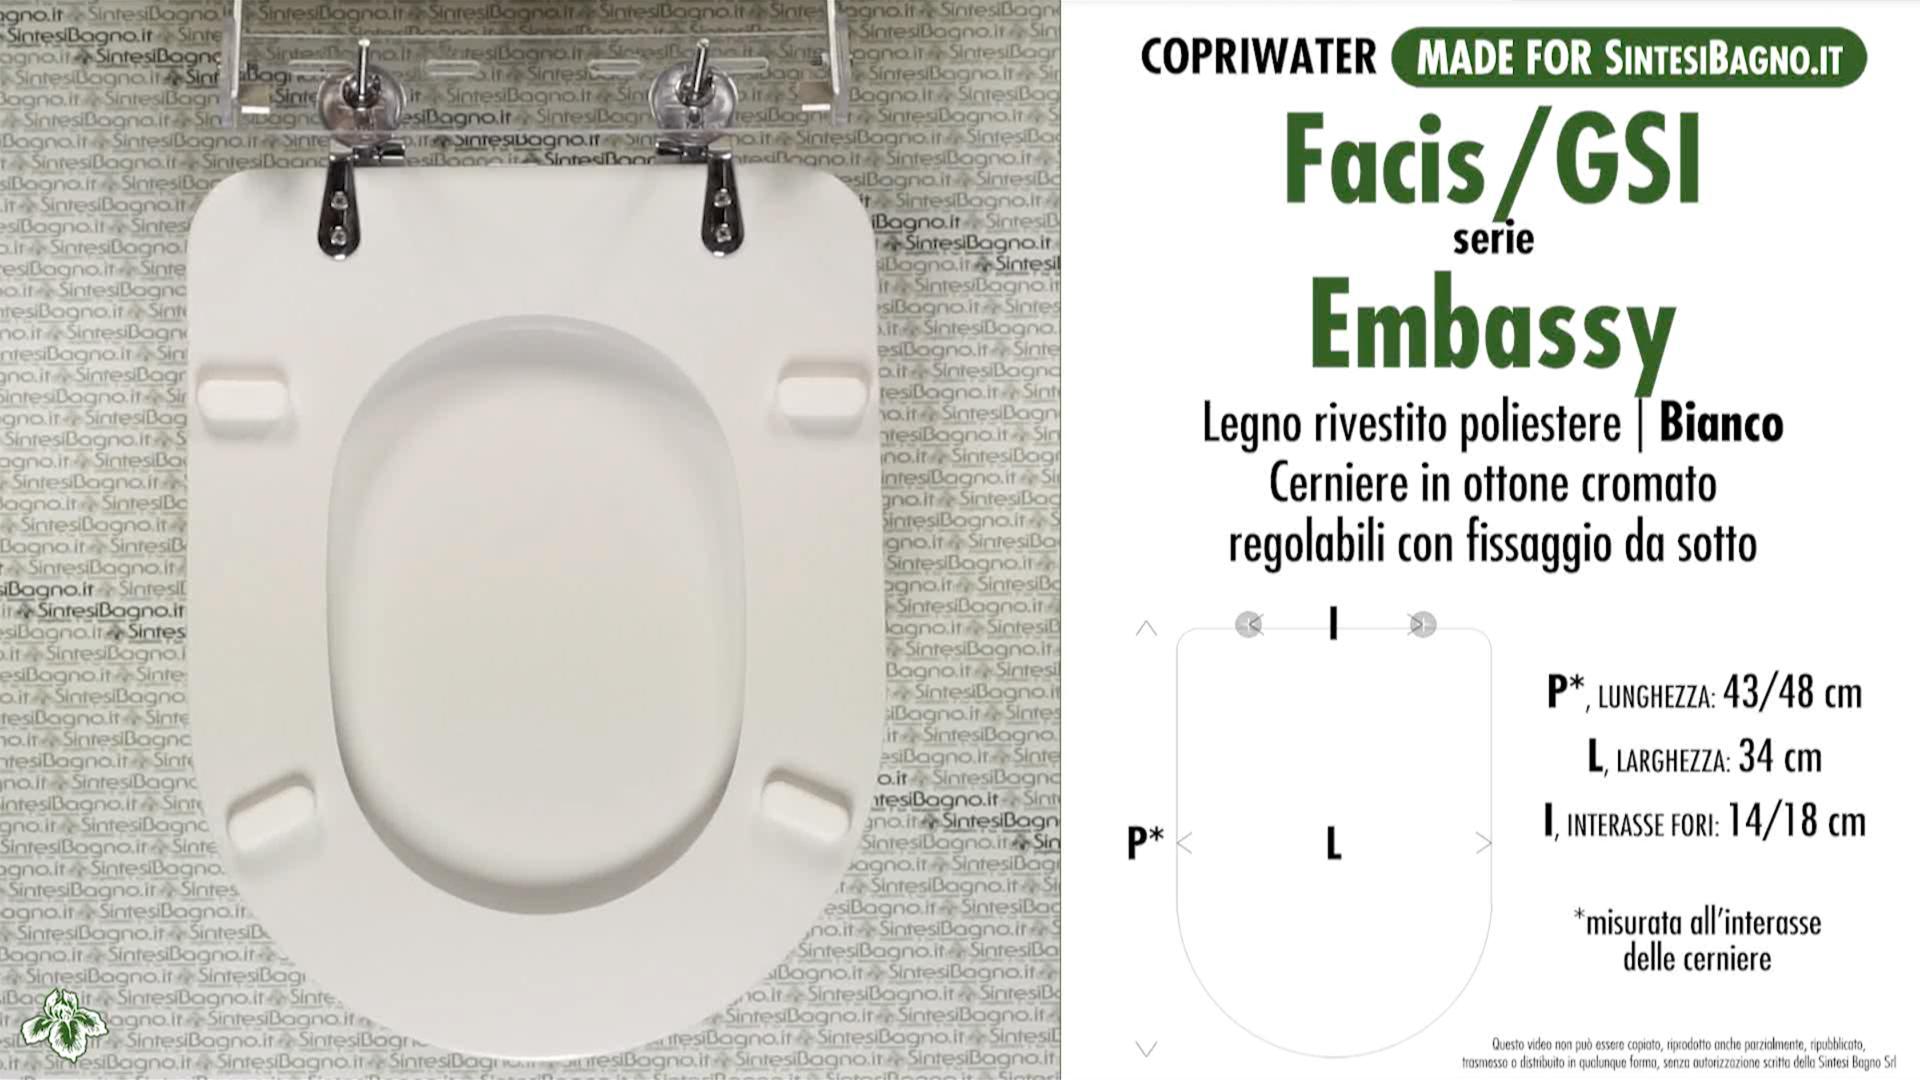 SCHEDA TECNICA MISURE copriwater FACIS/GSI EMBASSY